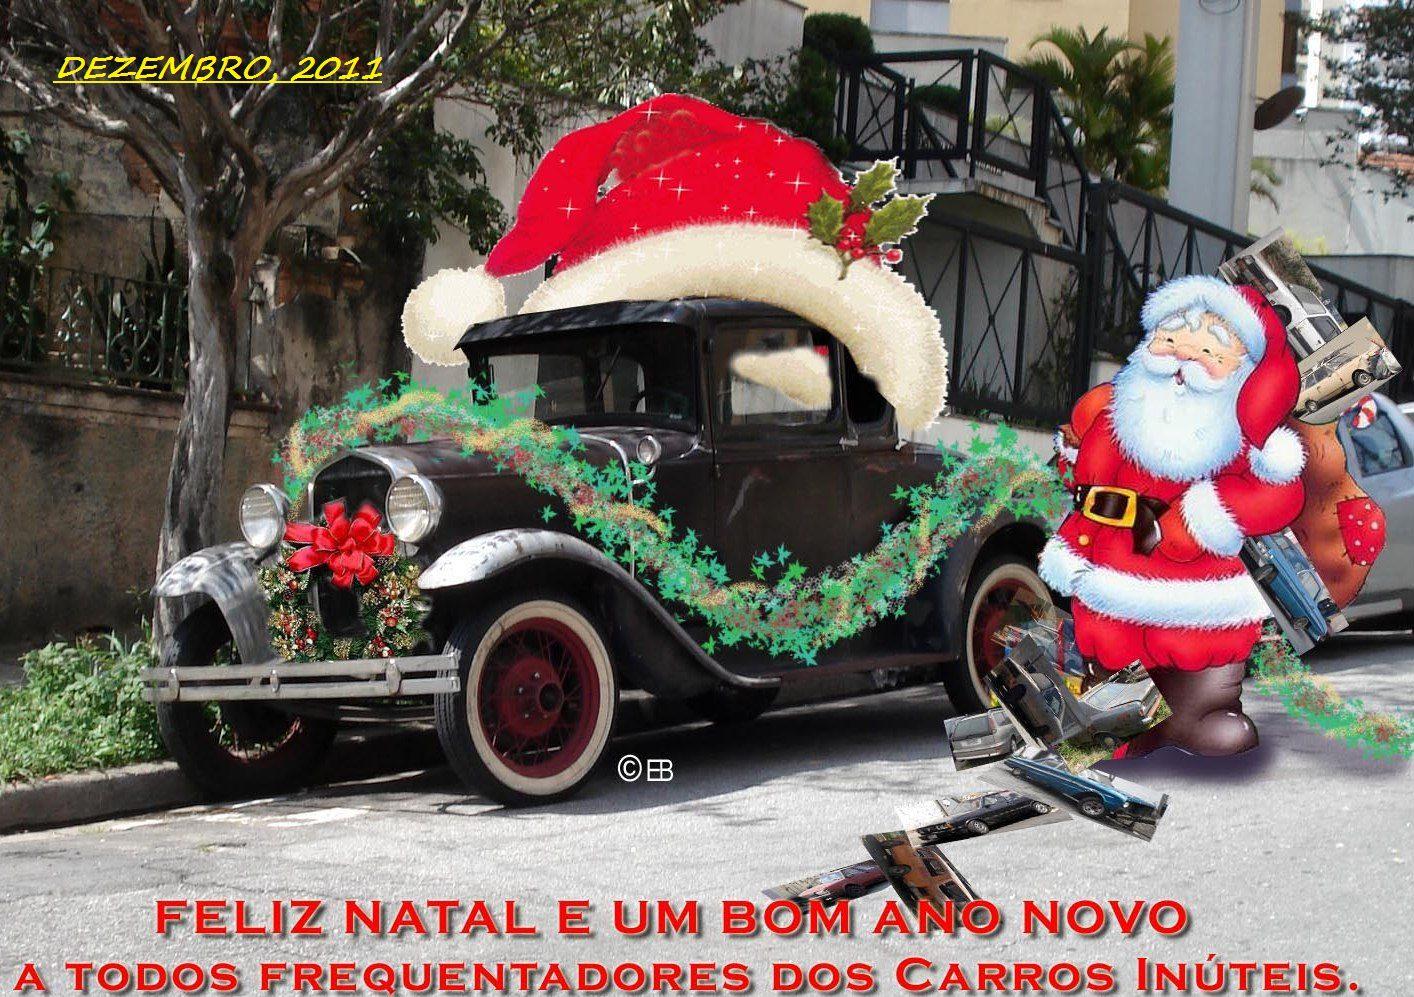 Natal Feliz Natal